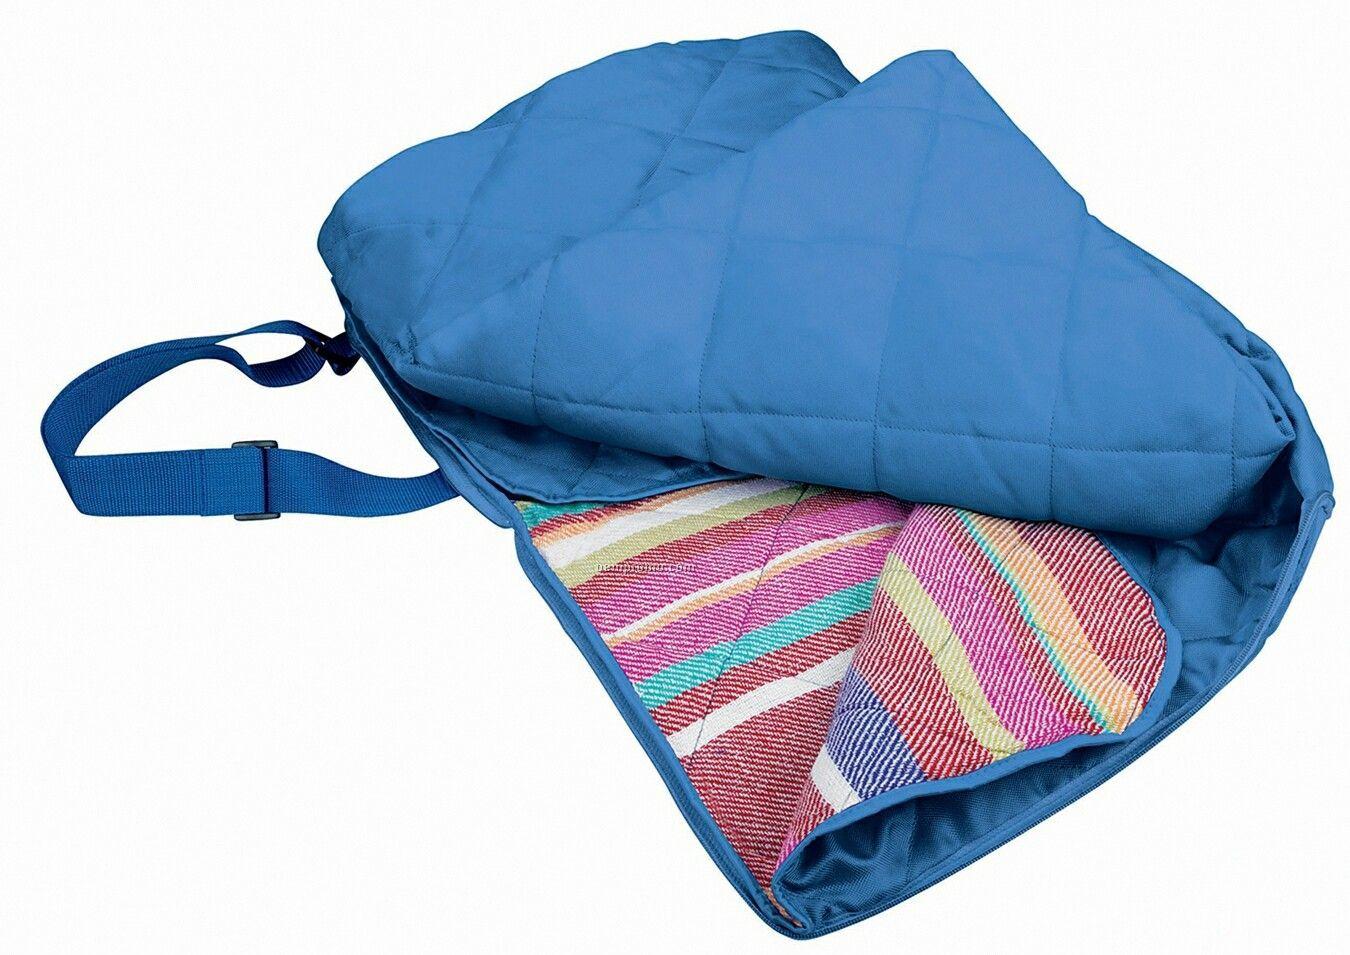 Air-tex Stadium Seat Picnic Blanket W/ Front Slash Pocket